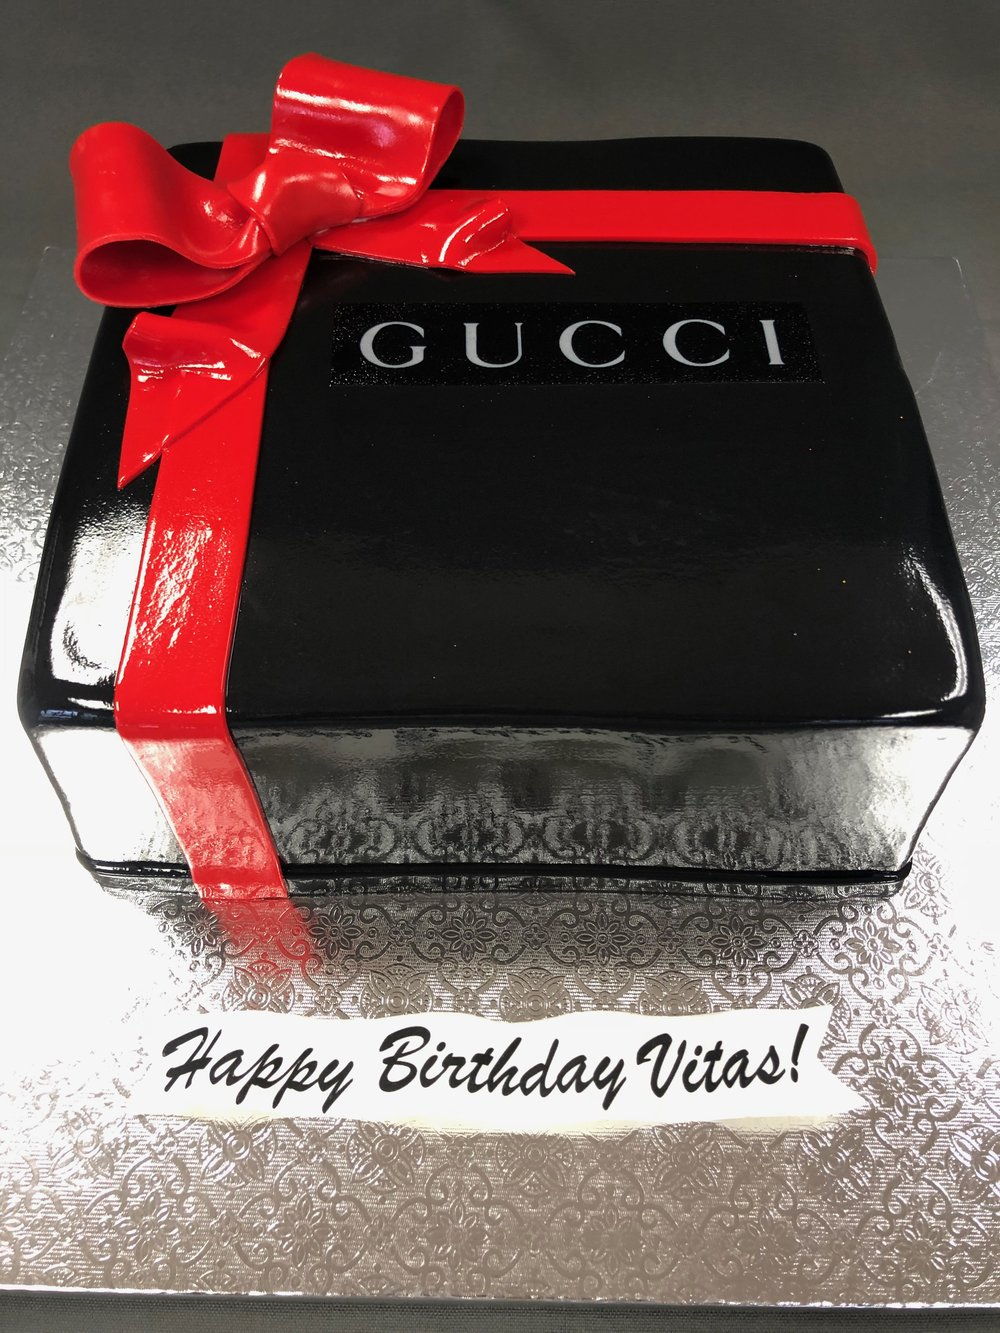 Birthday Gucci Box Cake New Jersey